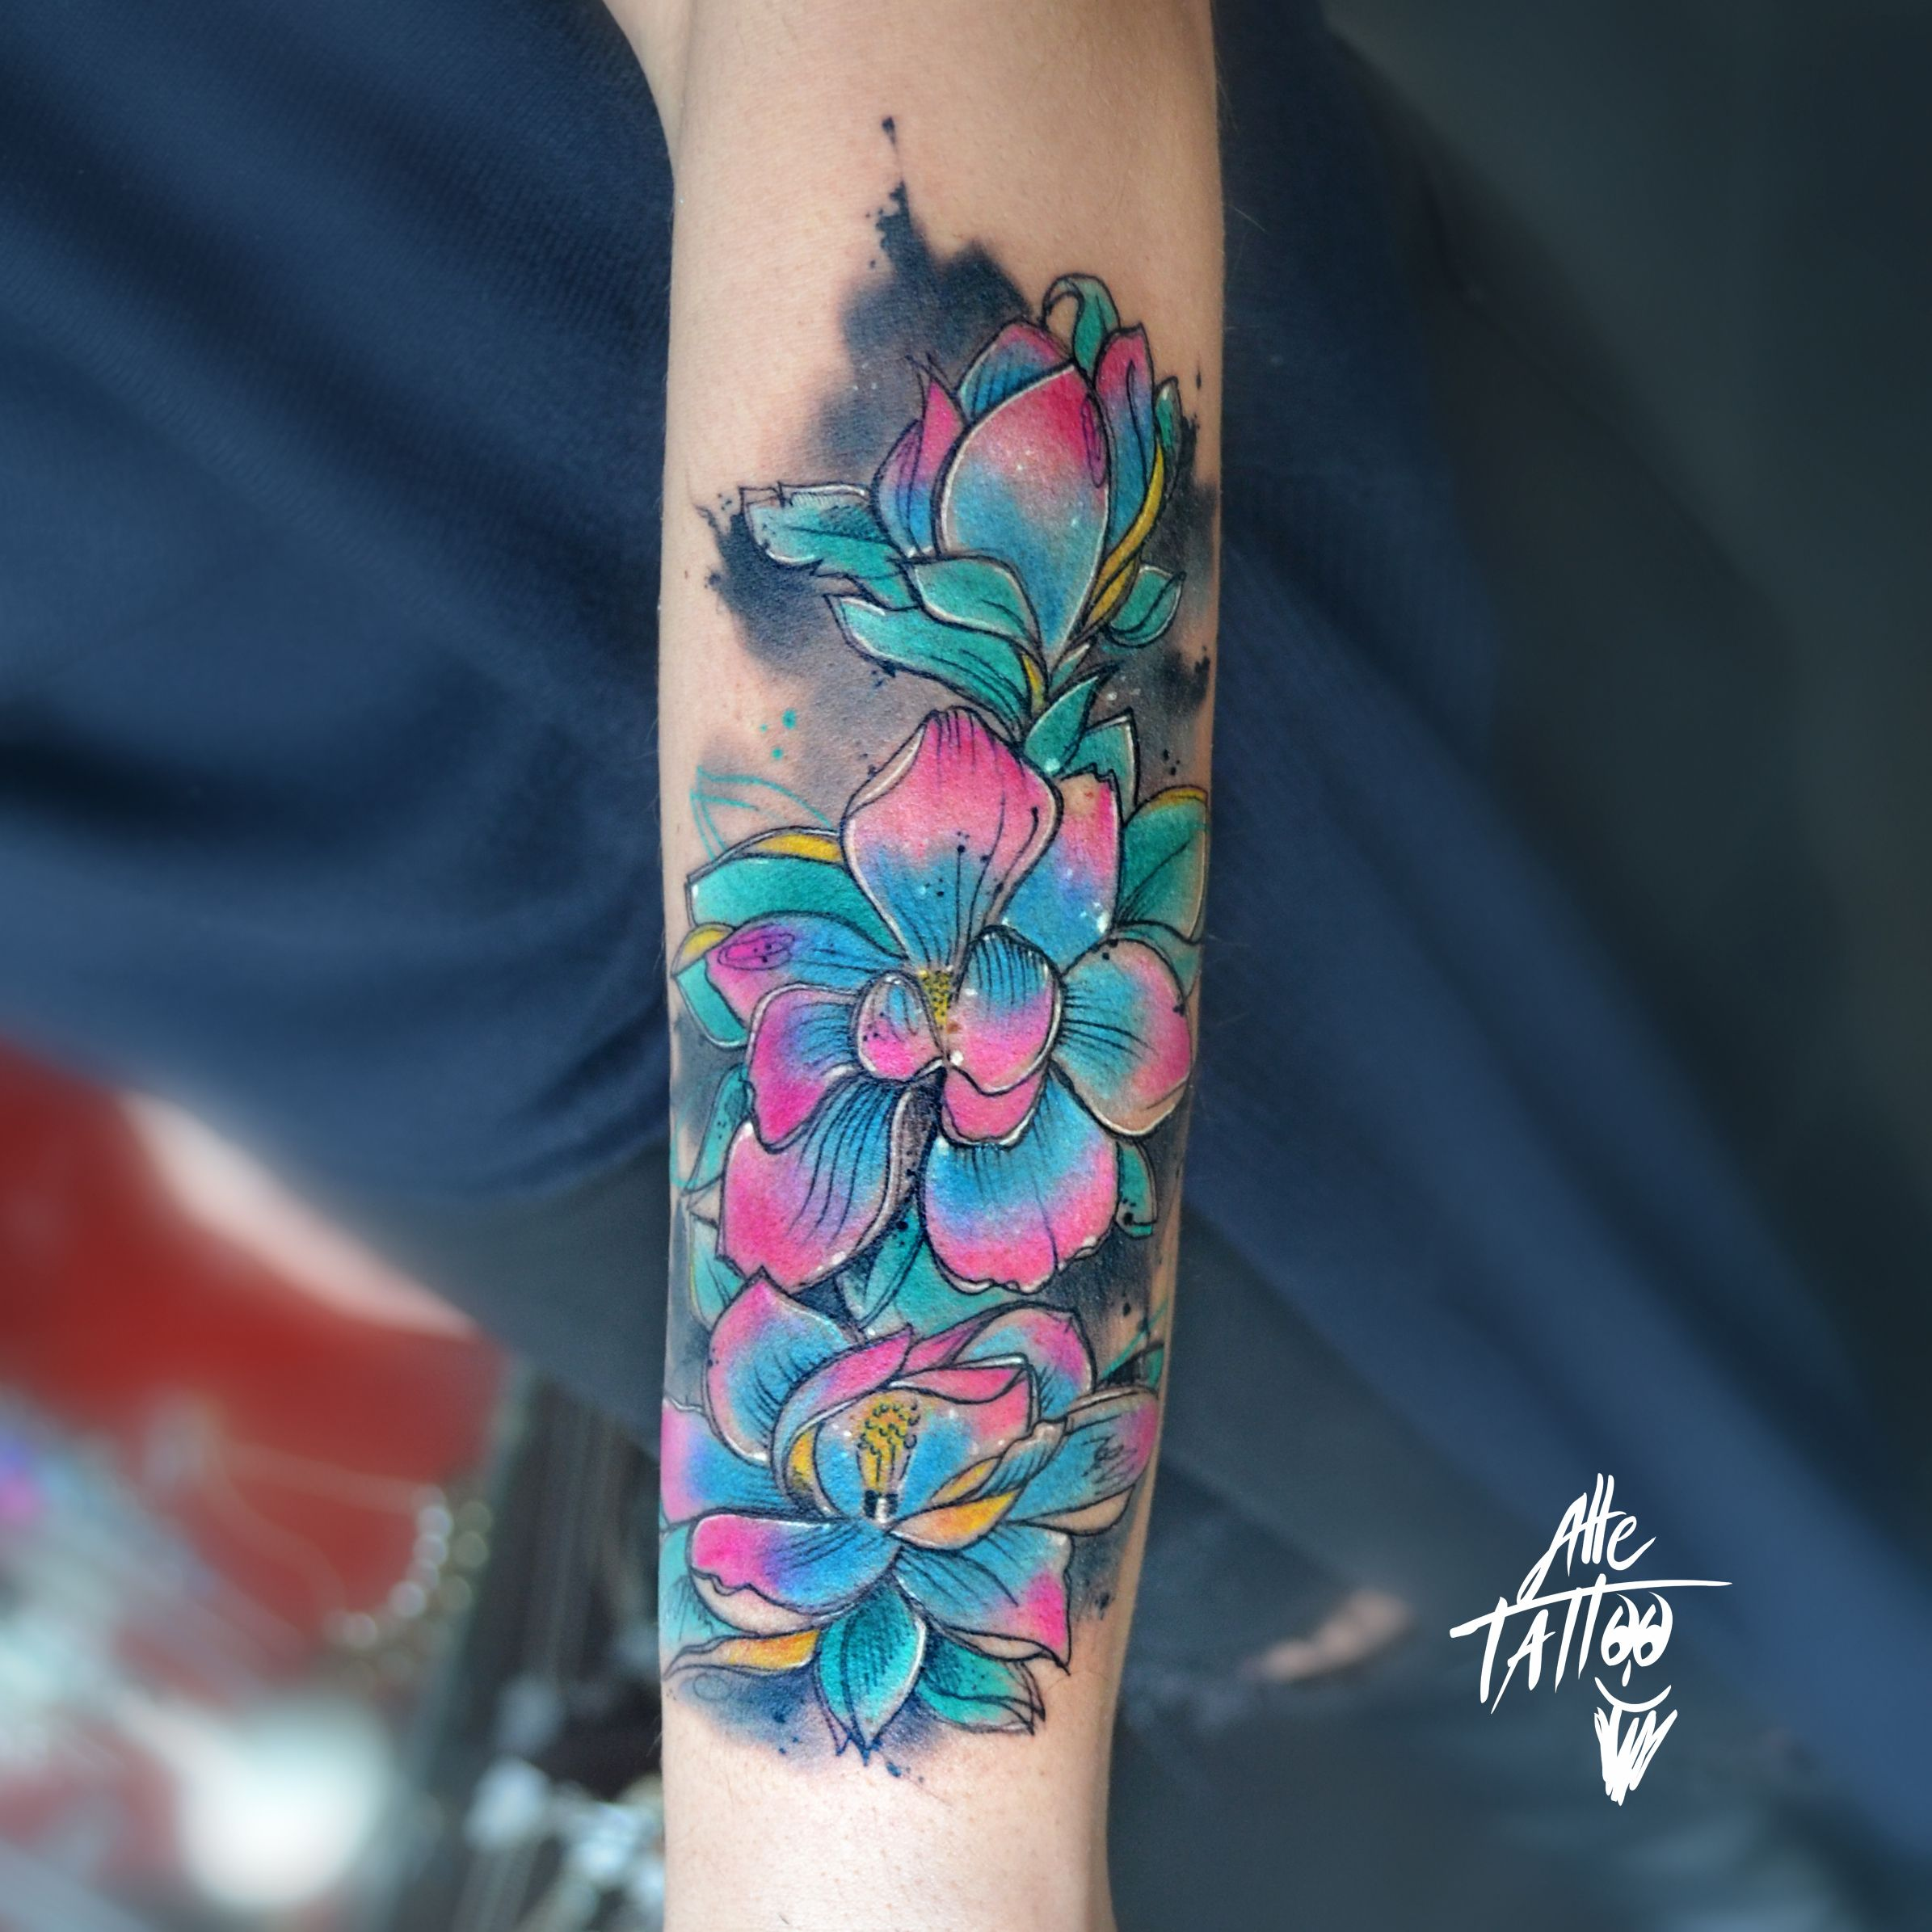 #alletattoo #magnolia #flowers #tattoo #tatuaggio #colortattoo #watercolor #avantgarde